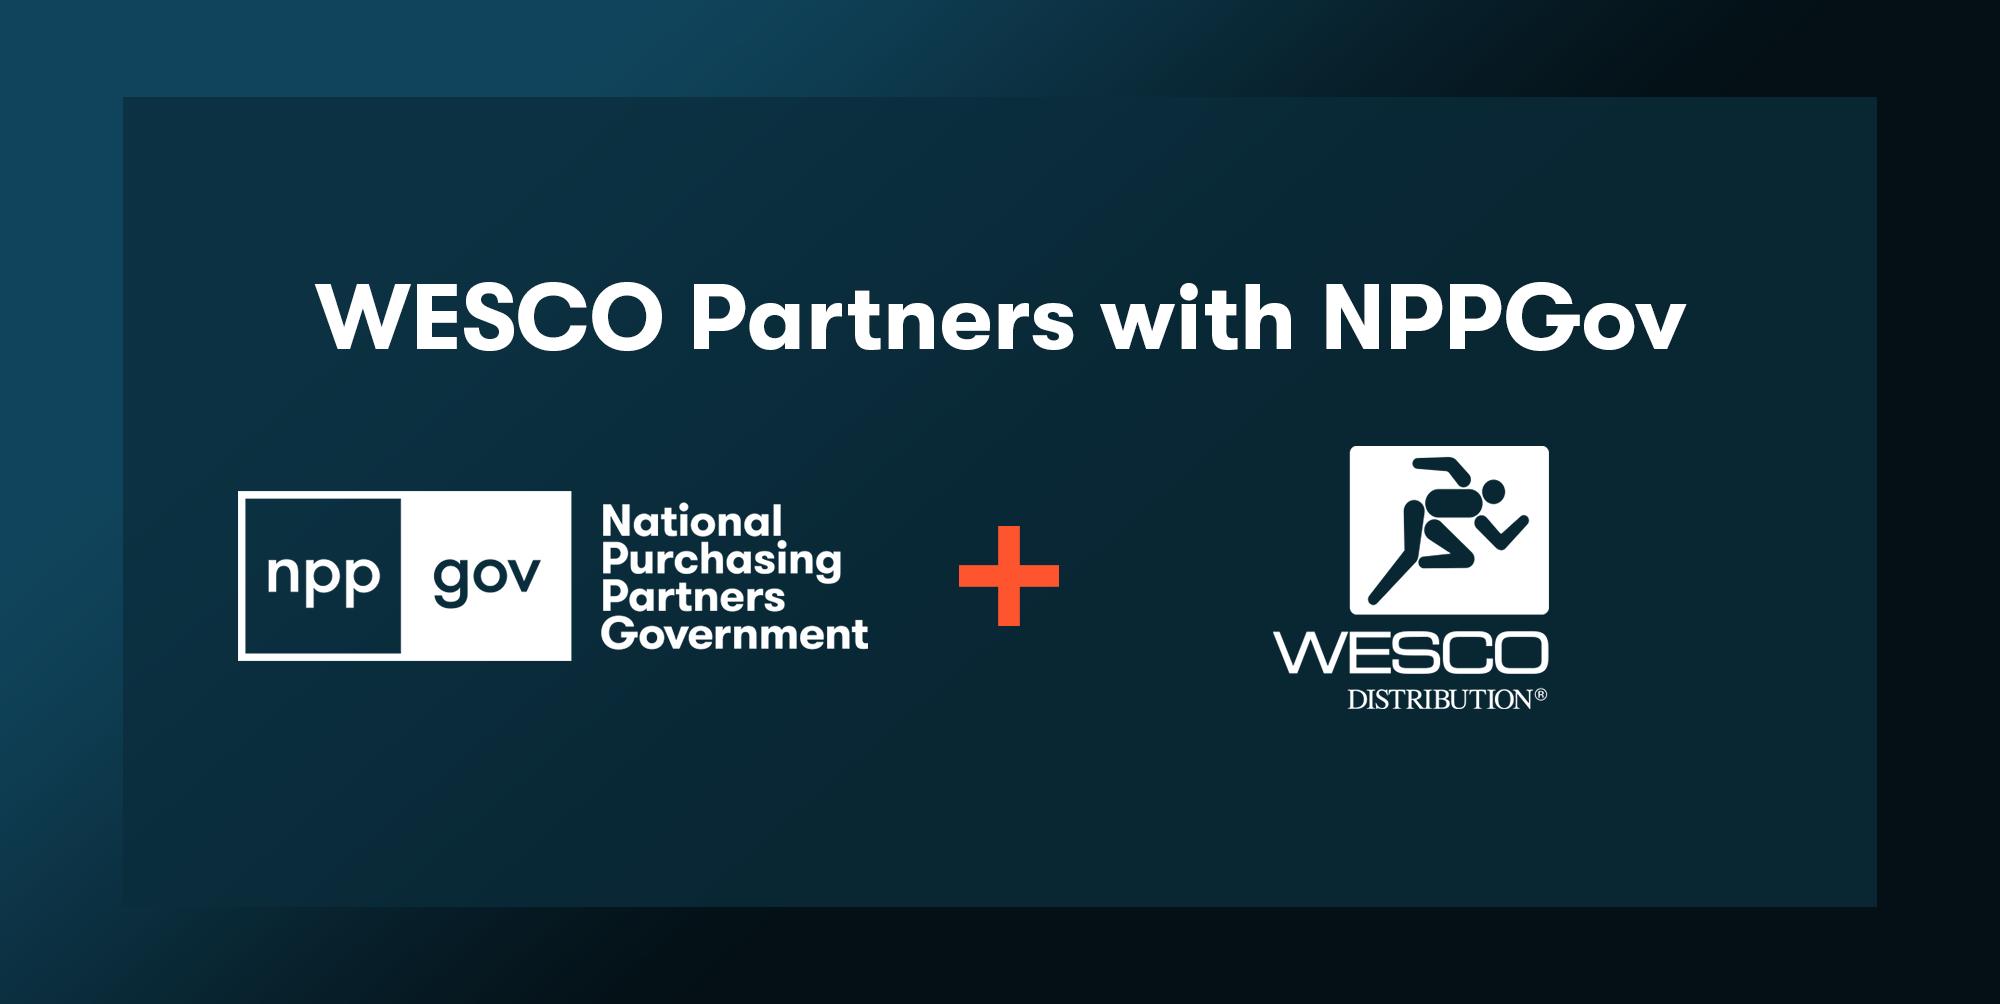 WESCO Partners with NPPGov